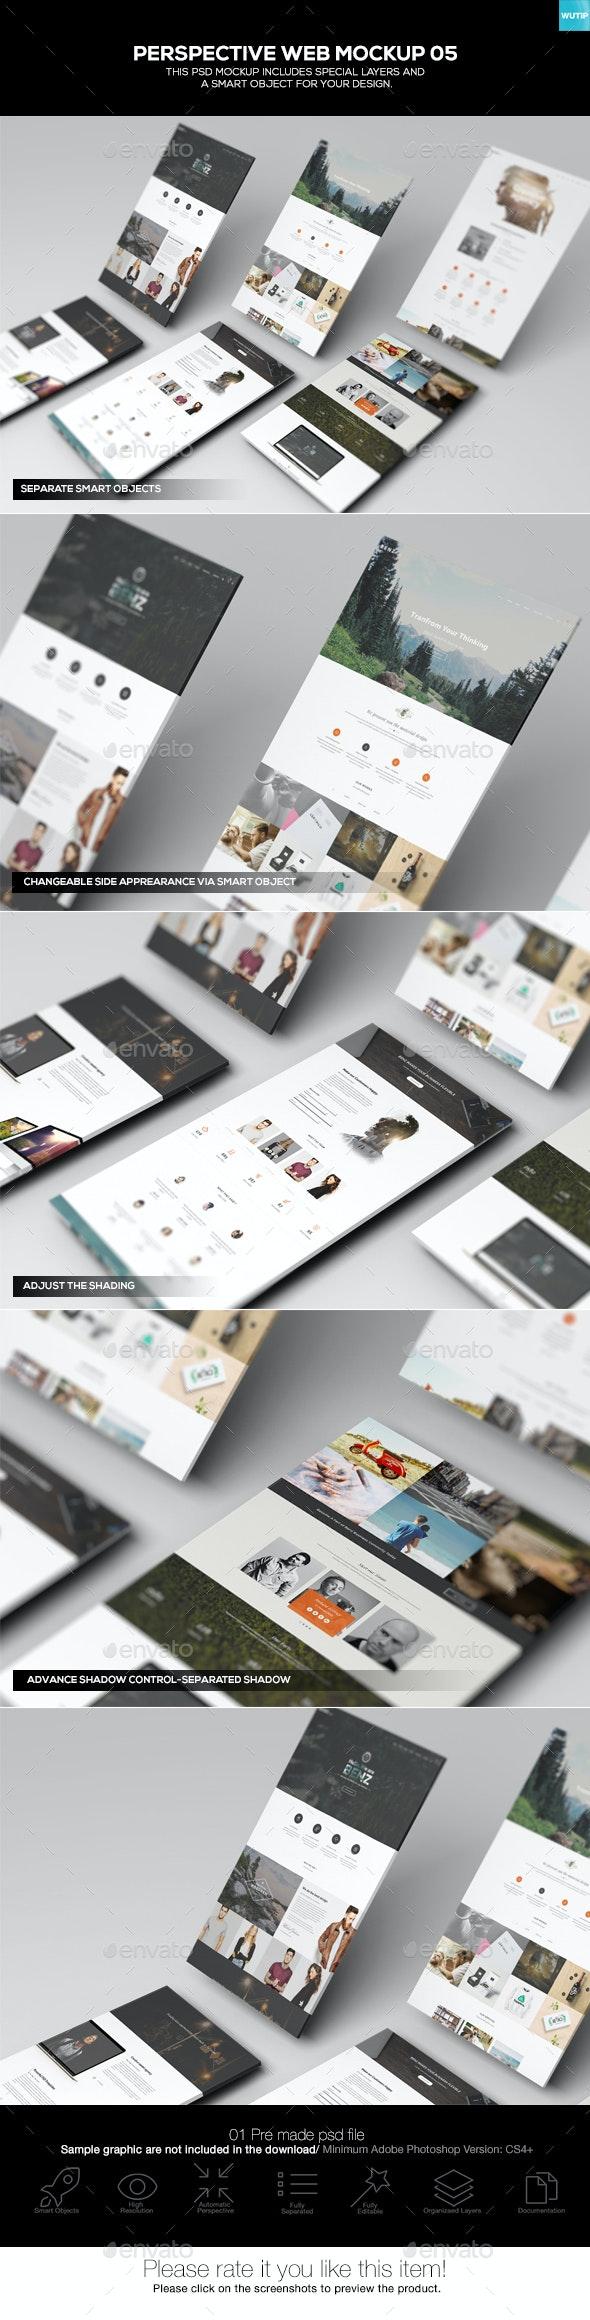 Perspective Web Mockup 05 - Website Displays